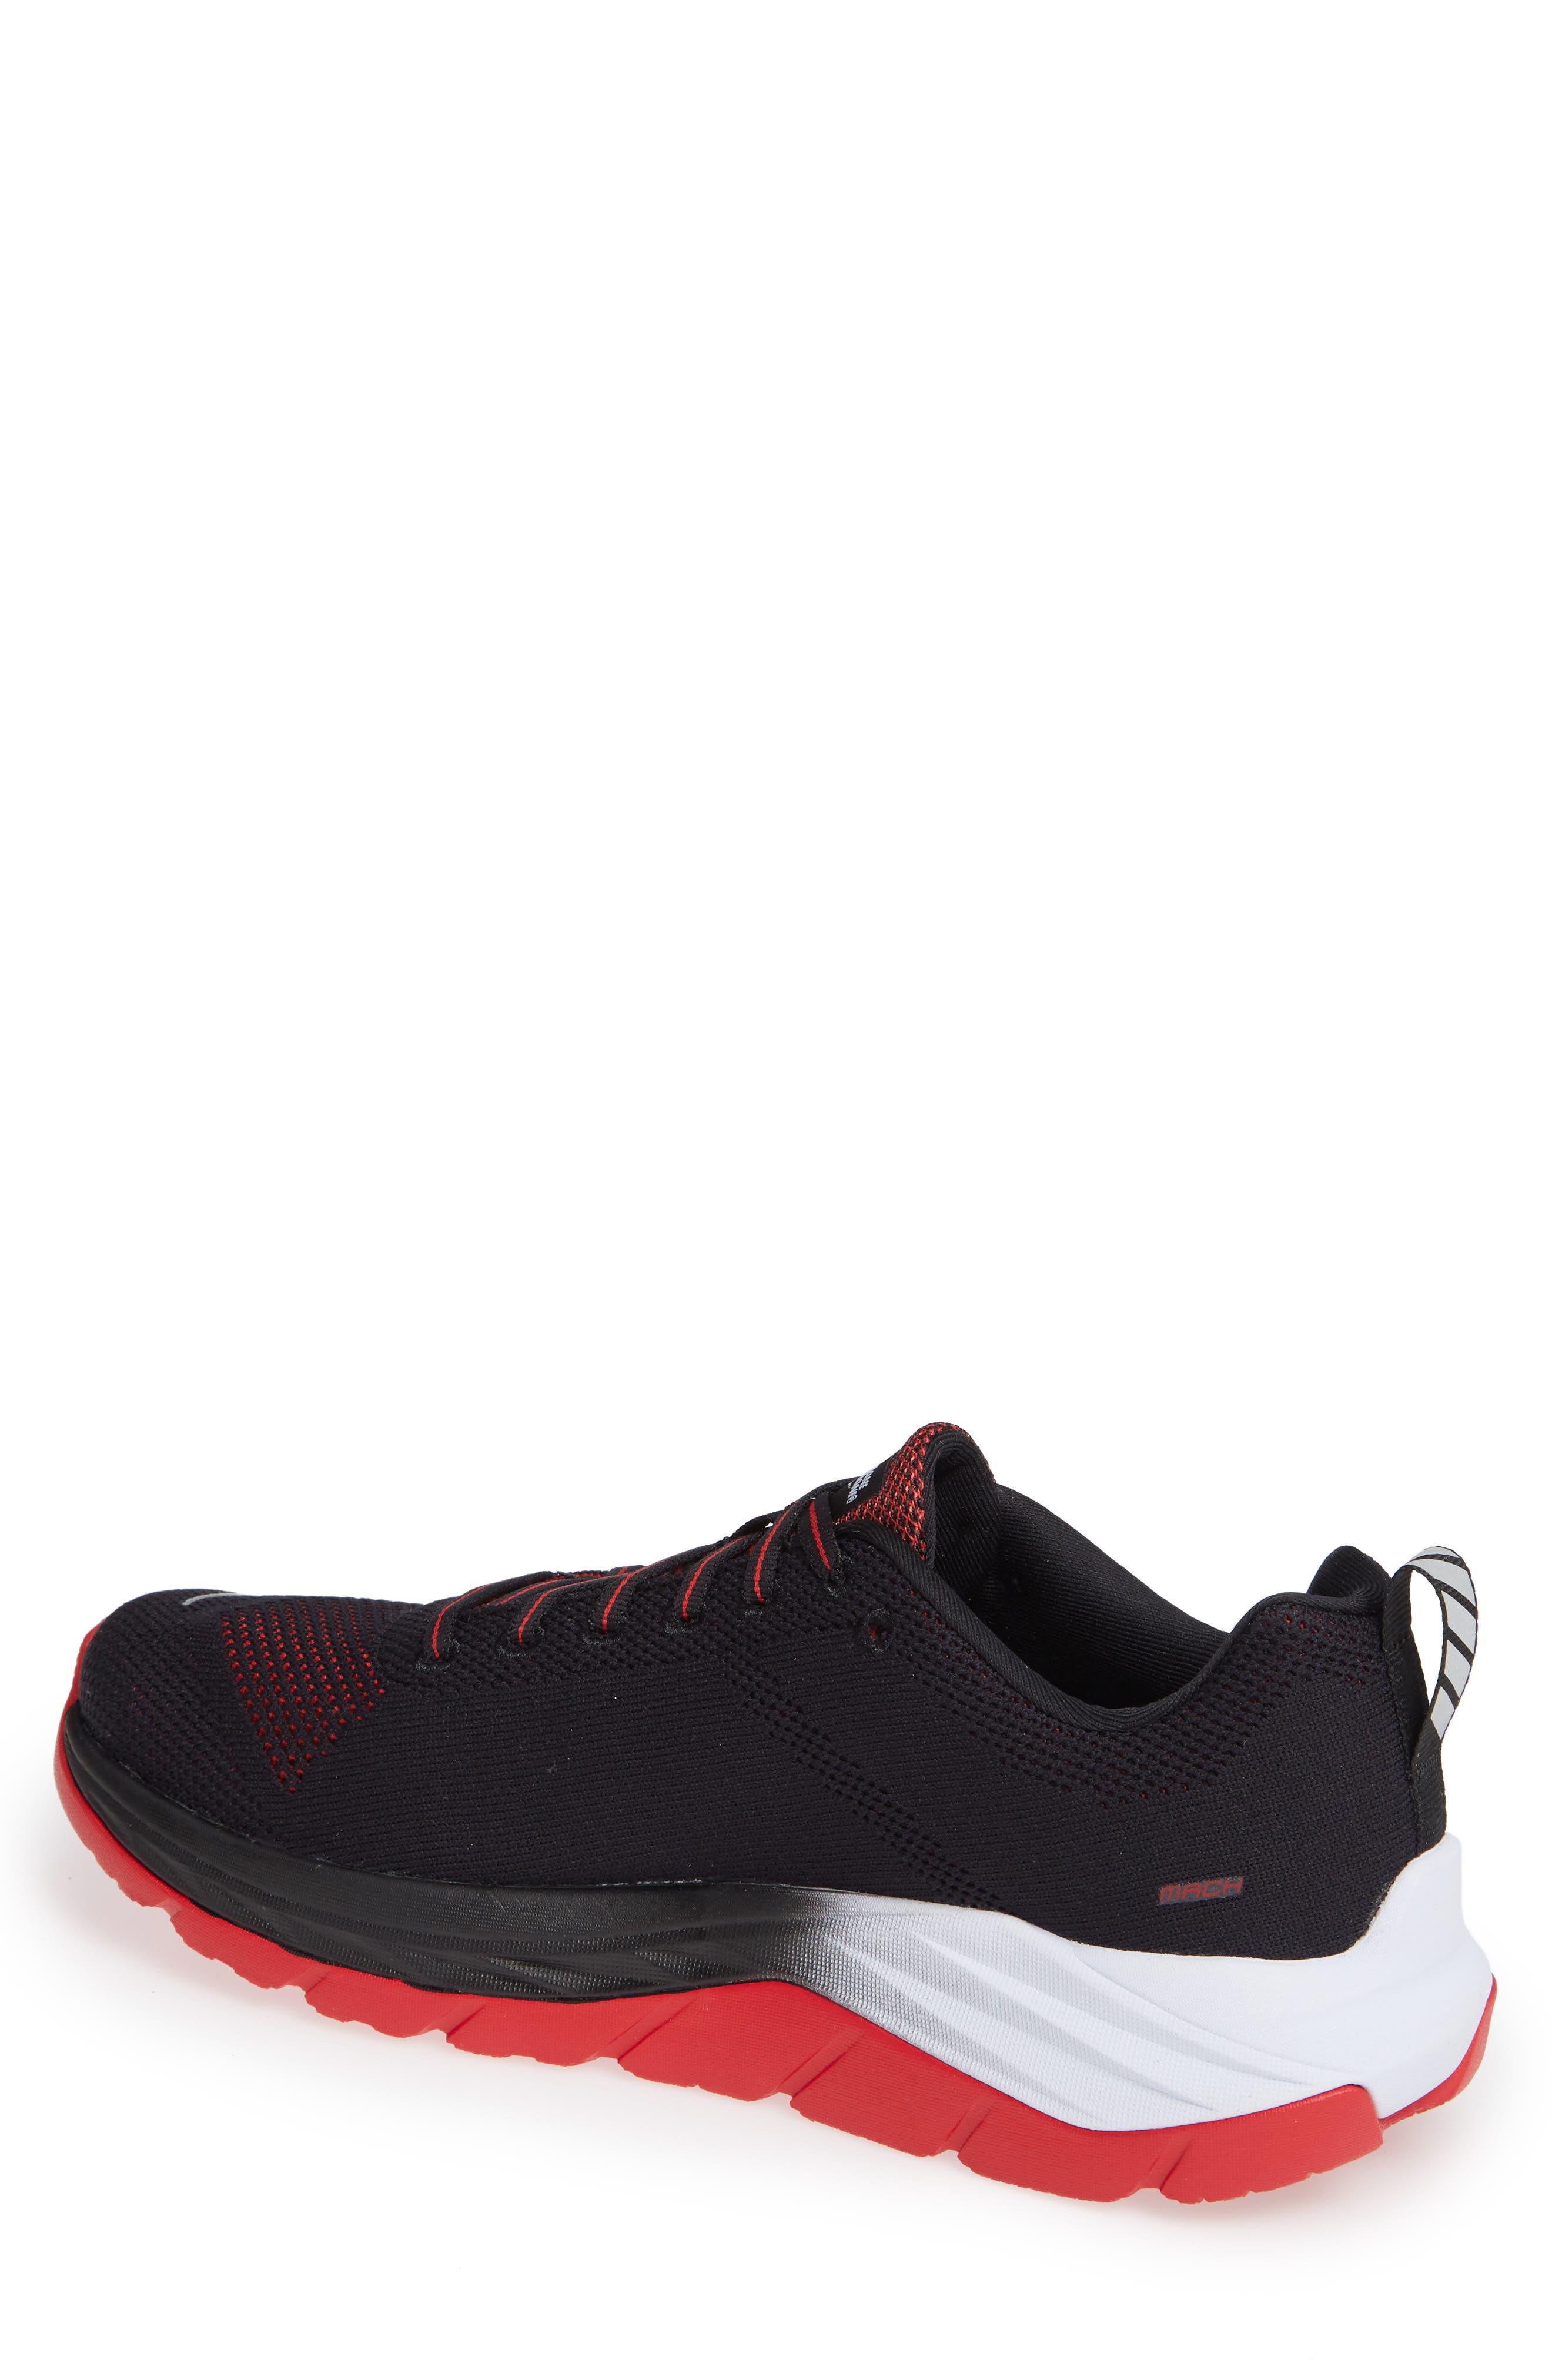 Mach Running Shoe,                             Alternate thumbnail 2, color,                             BLACK/ WHITE